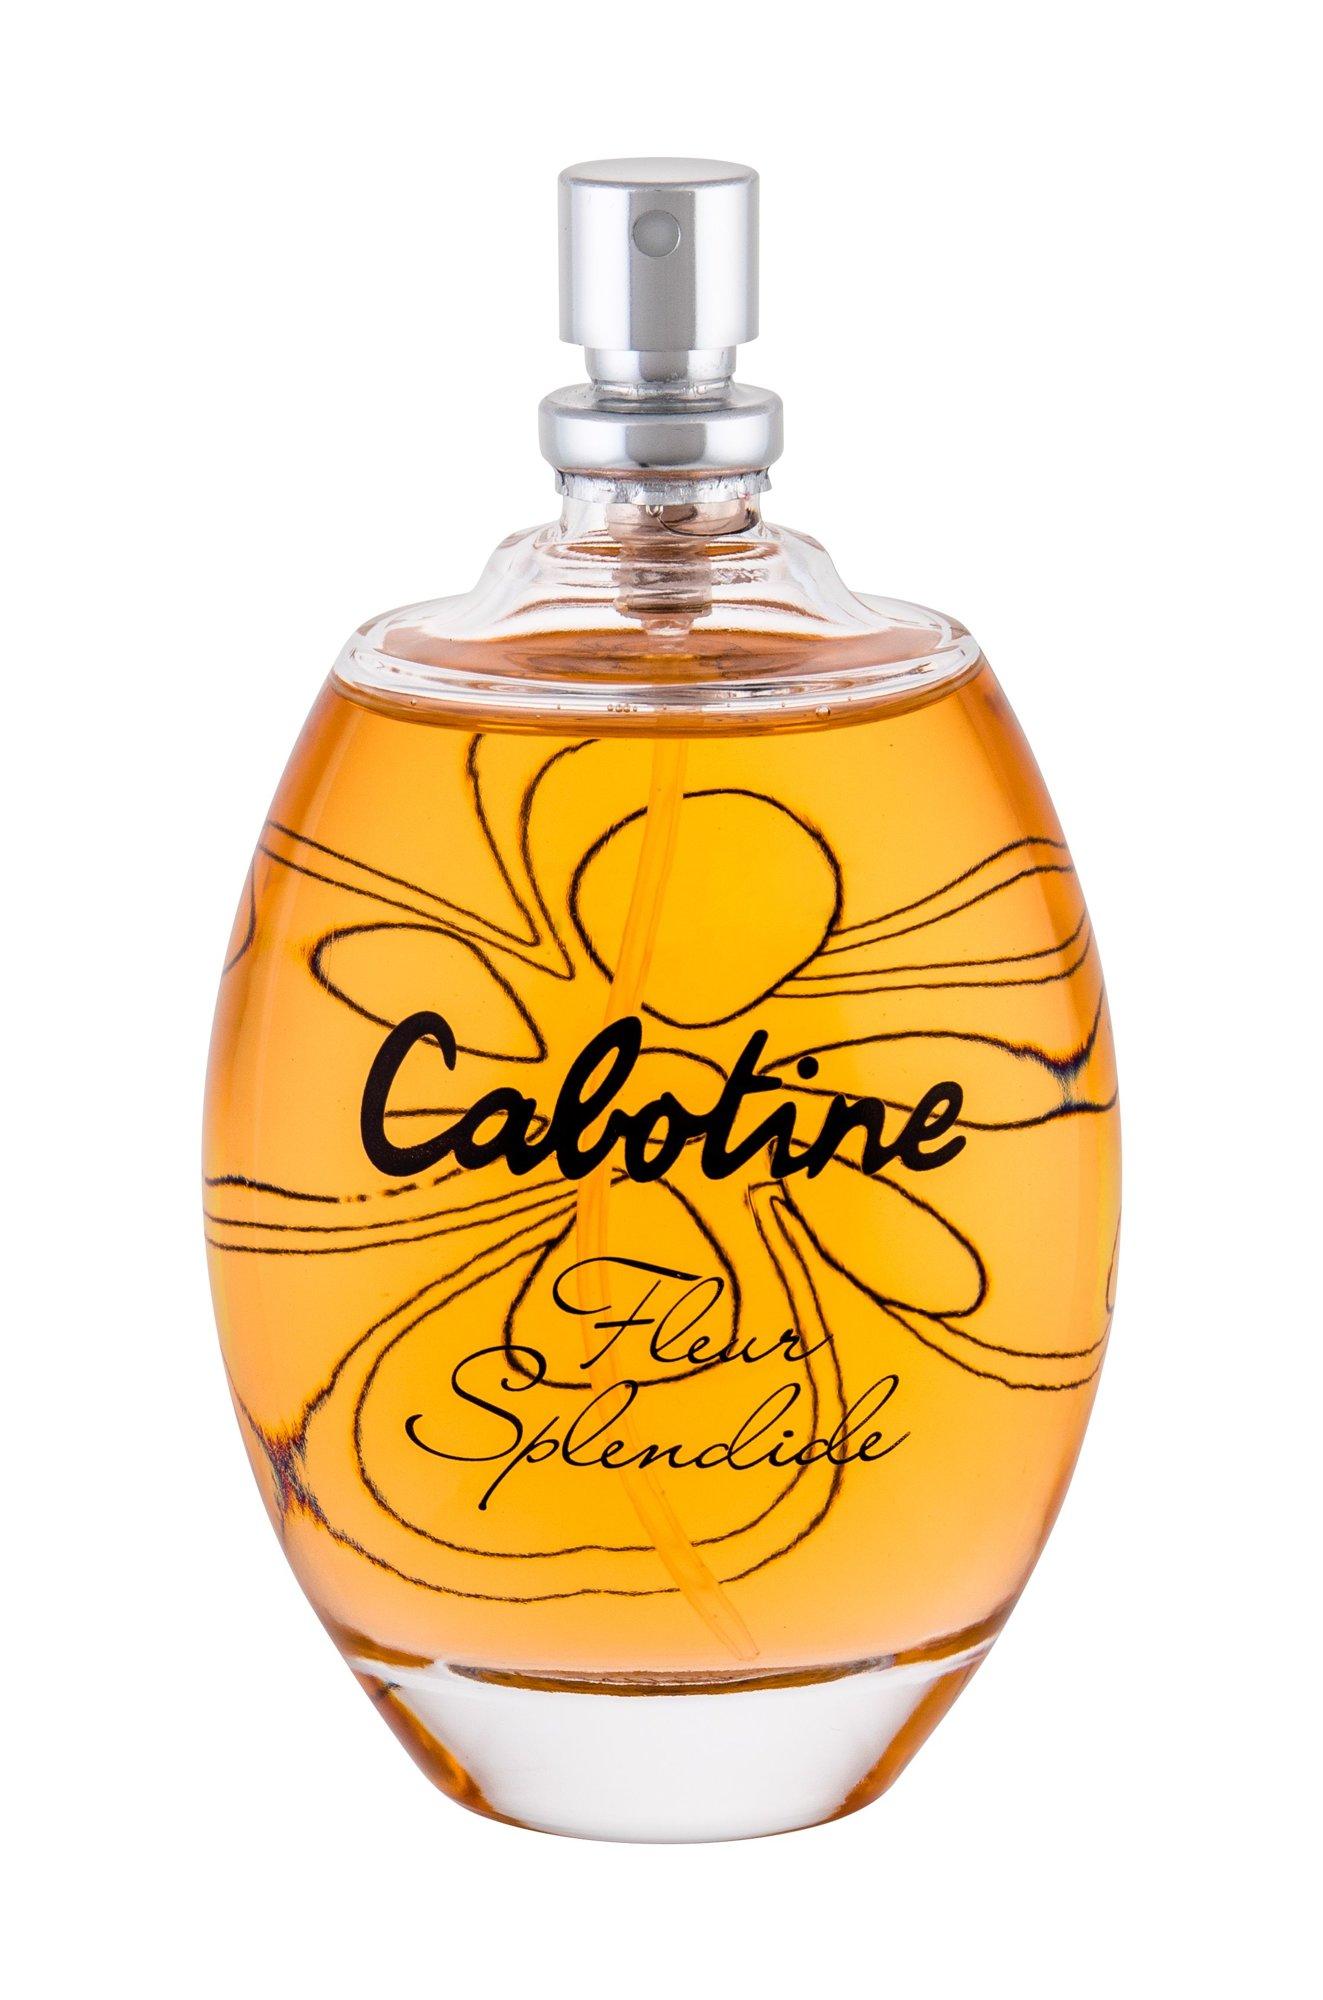 Gres Cabotine